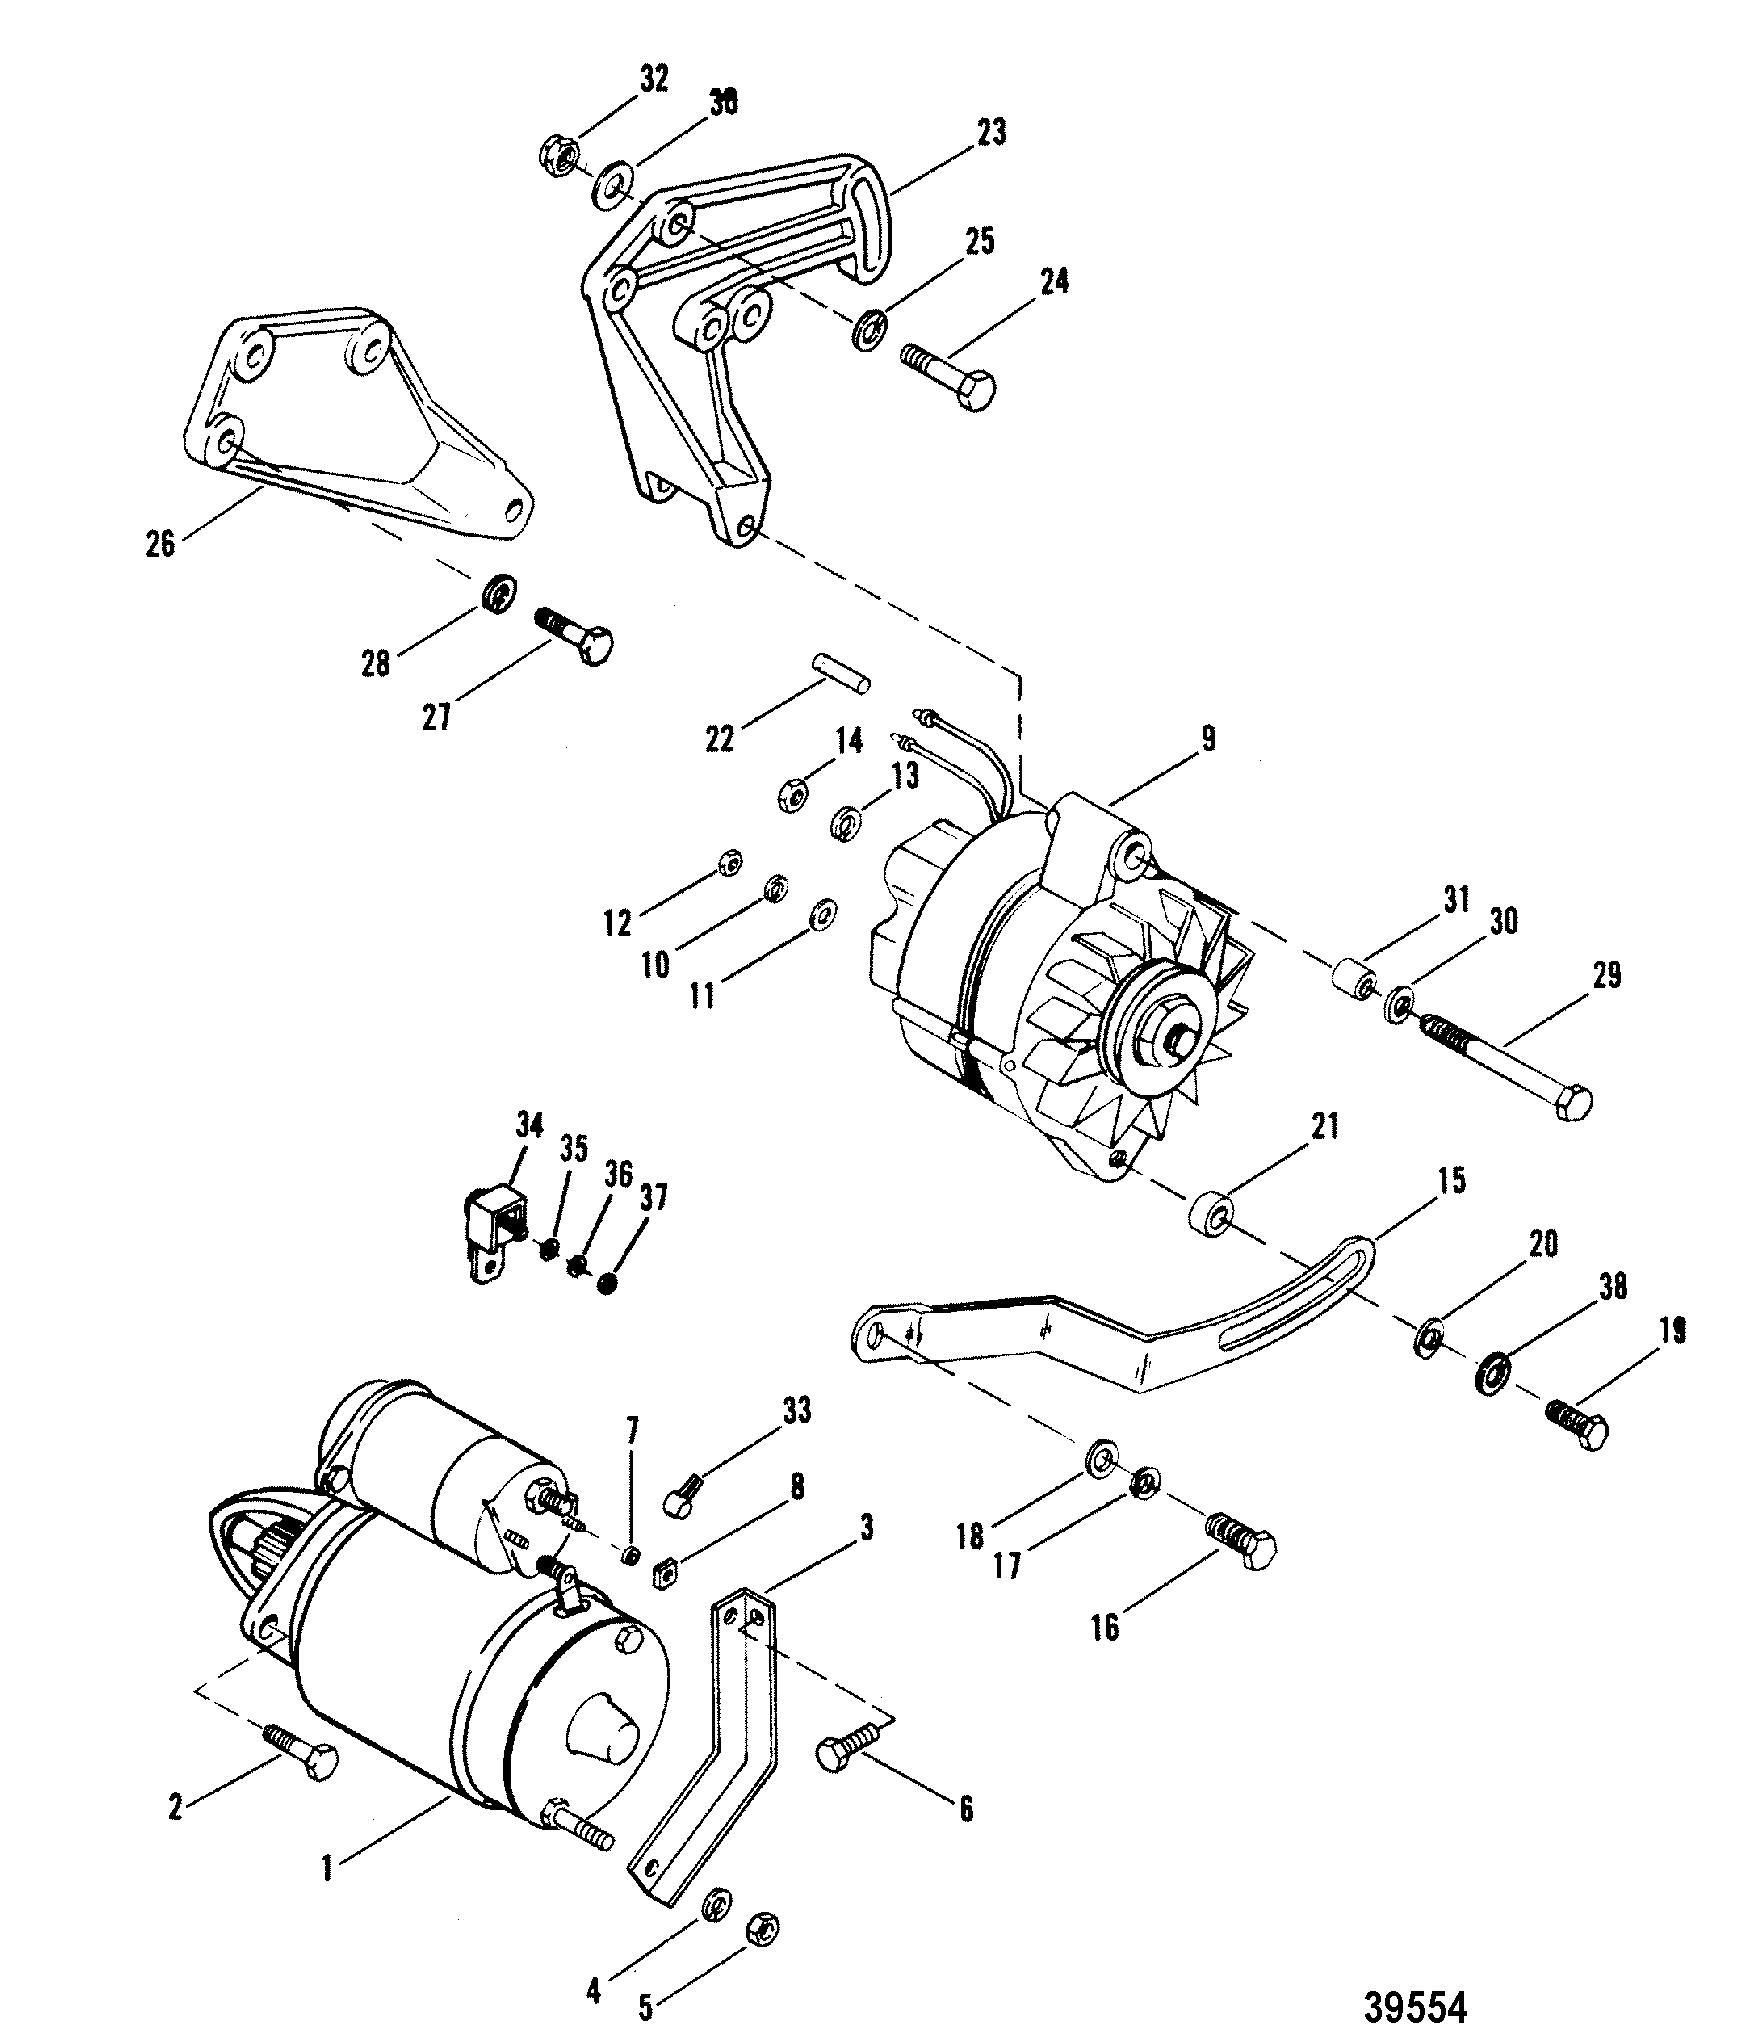 mercruiser 260 alternator wiring diagram flex a lite electric fan controller starter motor and for 898 200 228